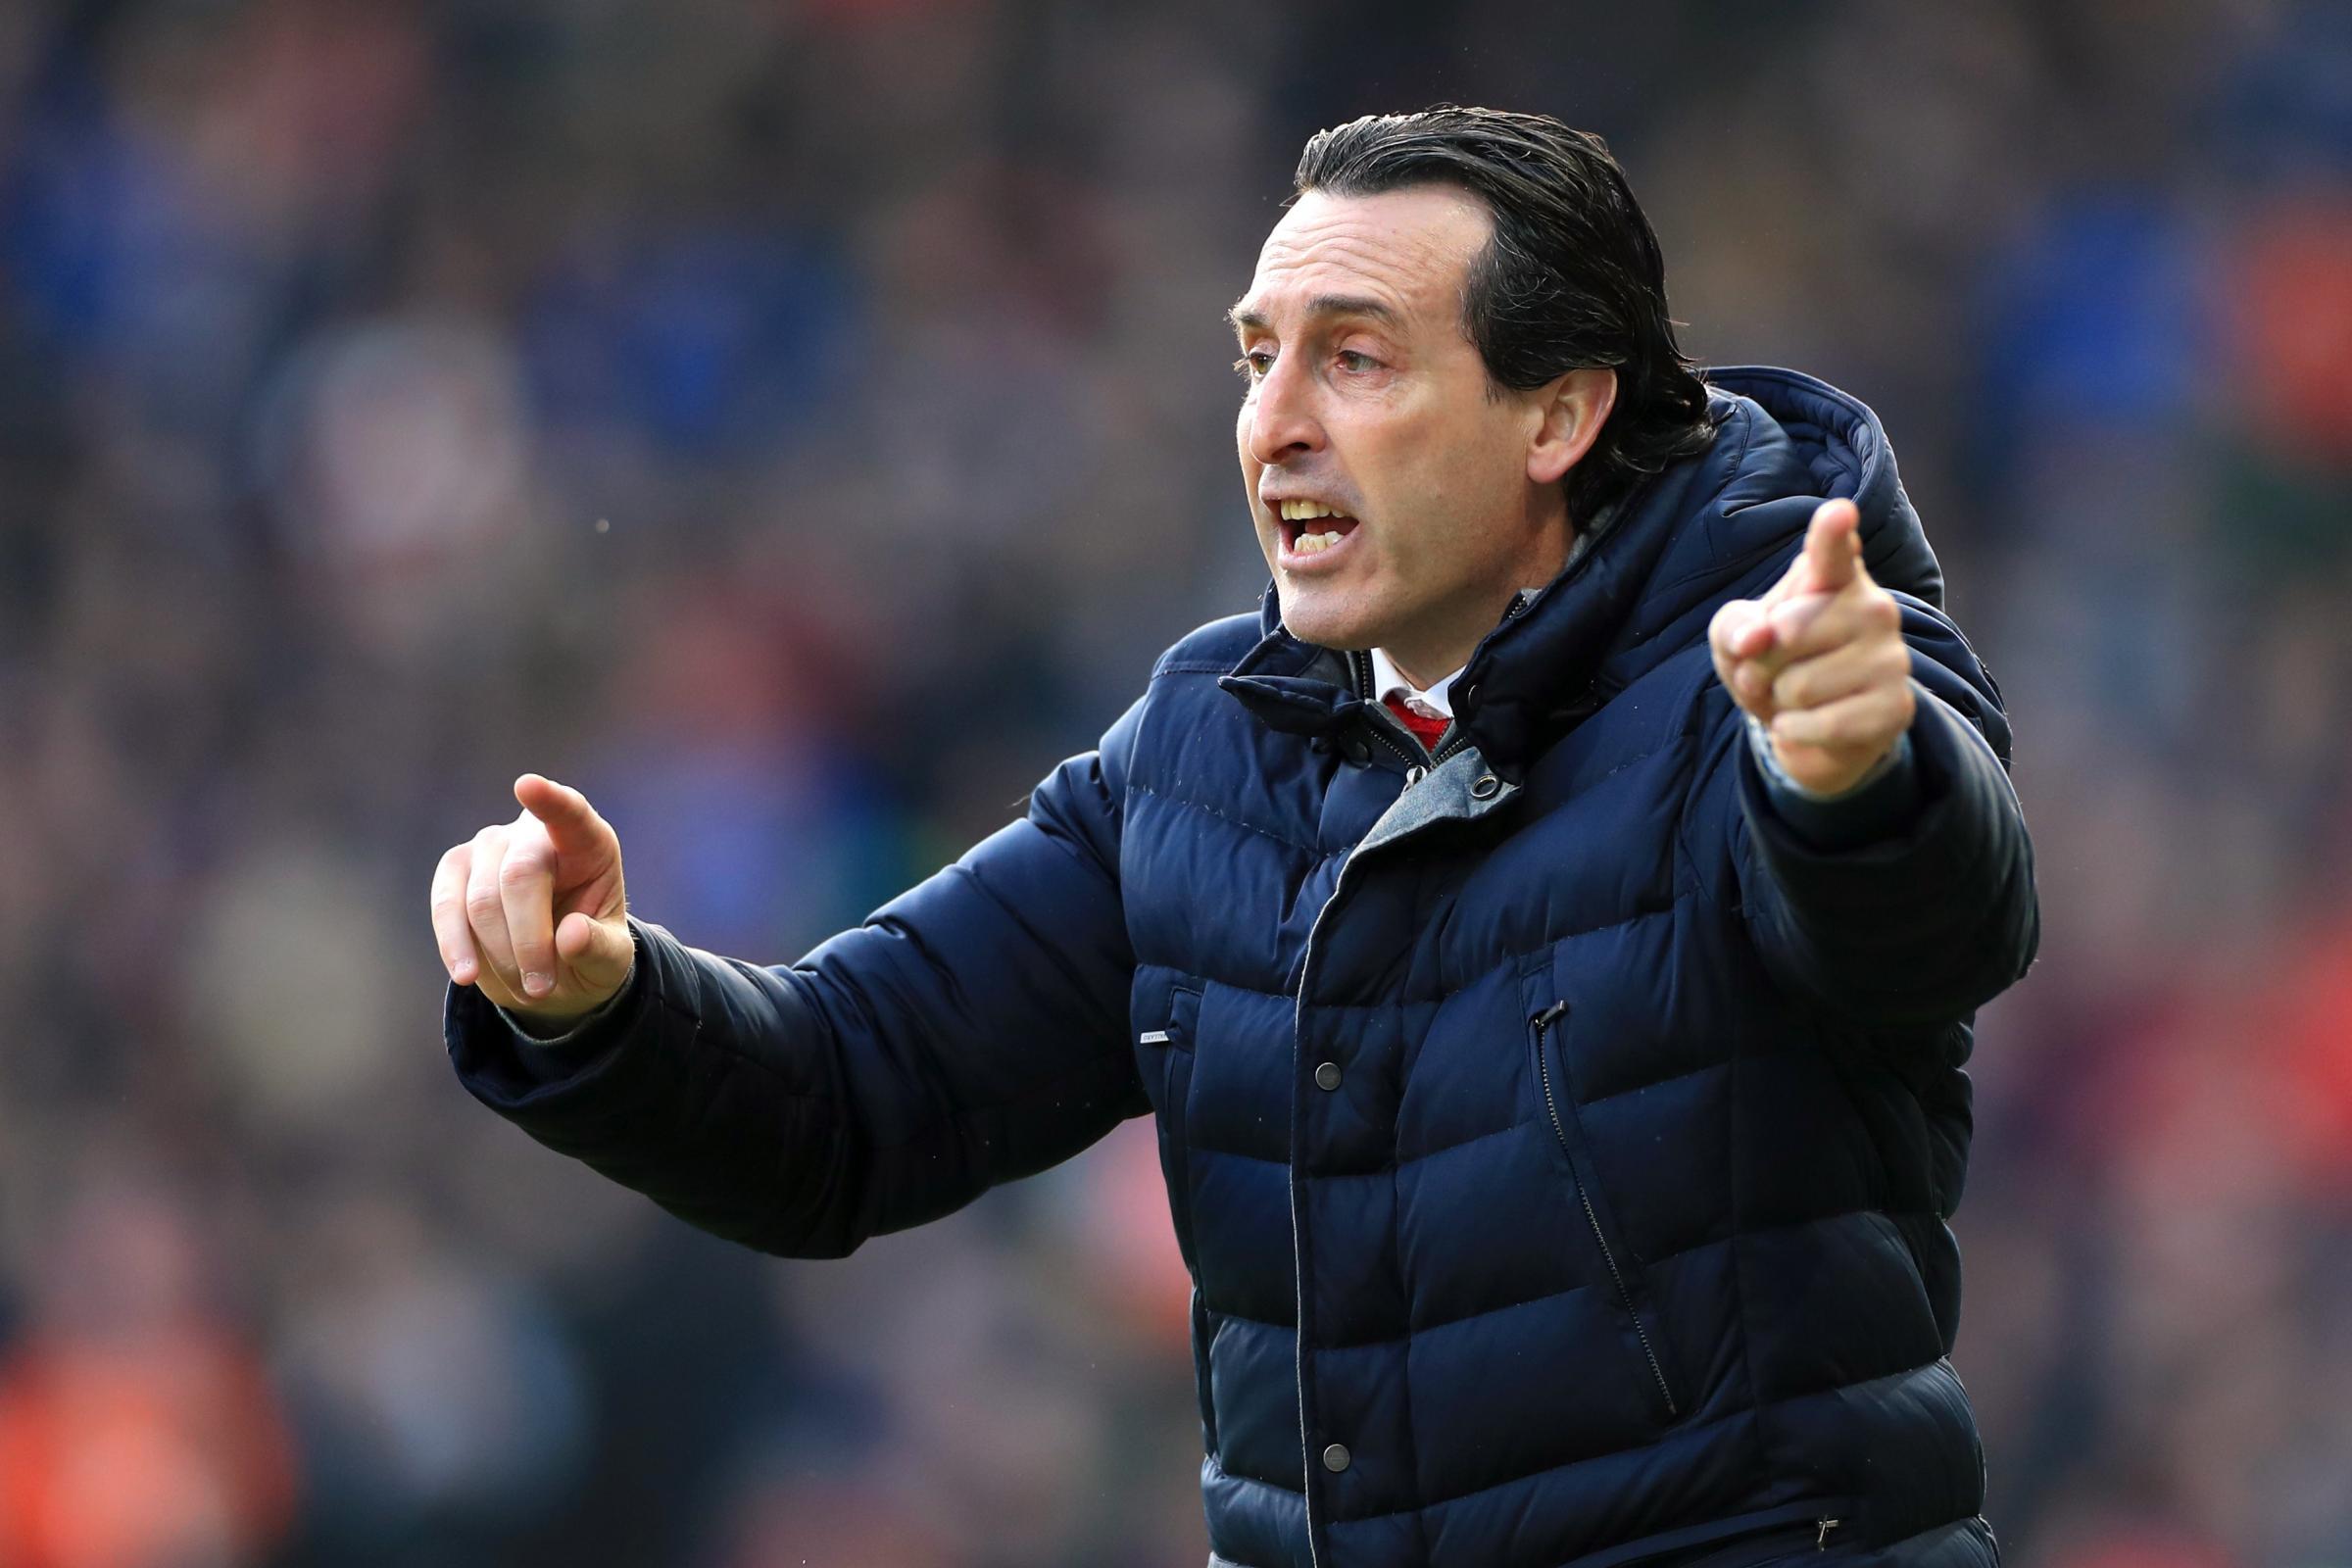 Unai Emery's Arsenal return to Europa League action against BATE Borisov